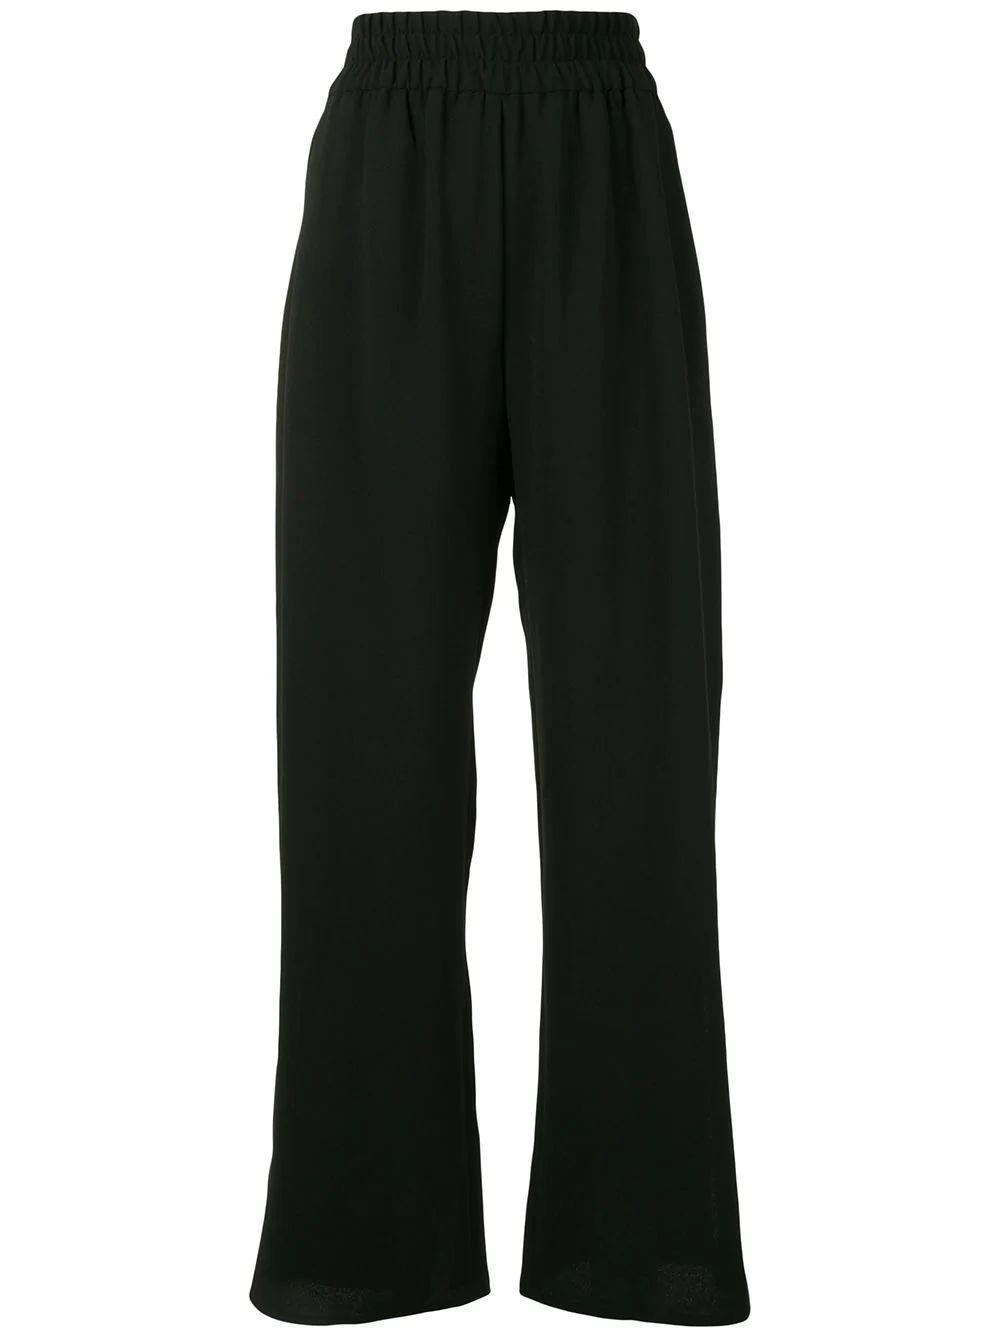 Poula Elastic Wide Leg Pant